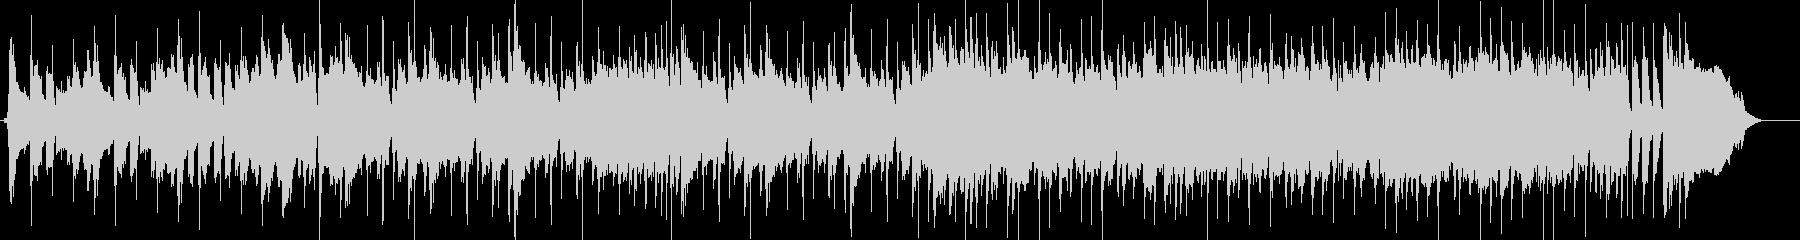 CM、スラップベースでの高揚感ある楽曲の未再生の波形